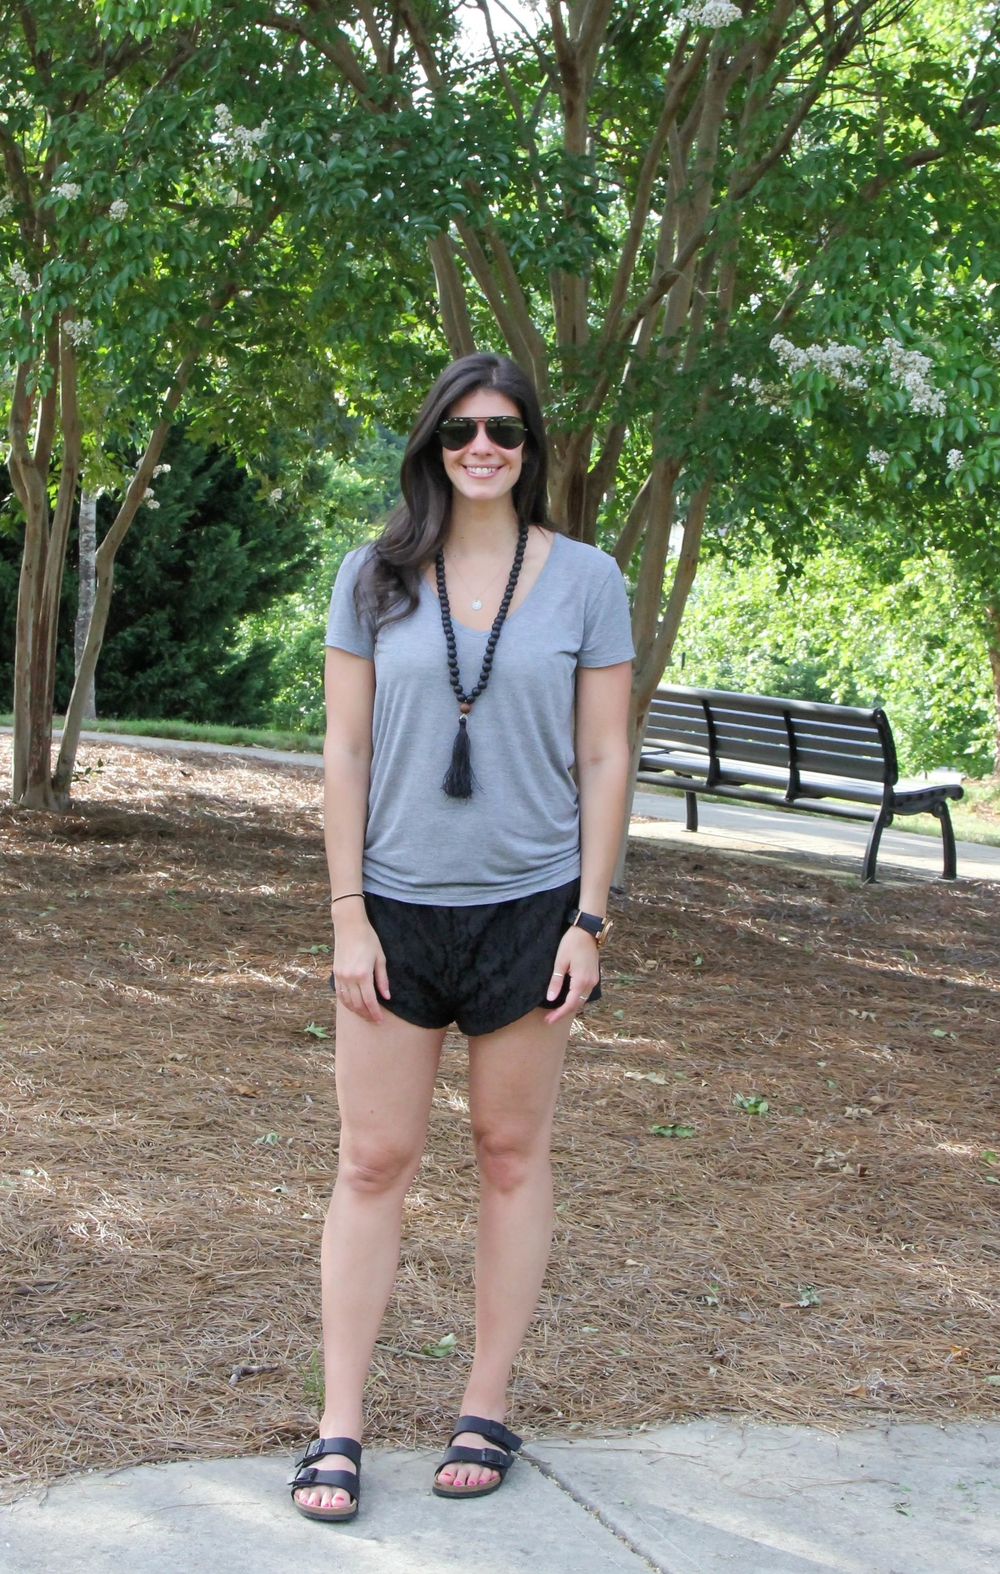 Summer-Style-Boho-Beads-Birkentstocks-LaurenSchwaiger-Style-Blog